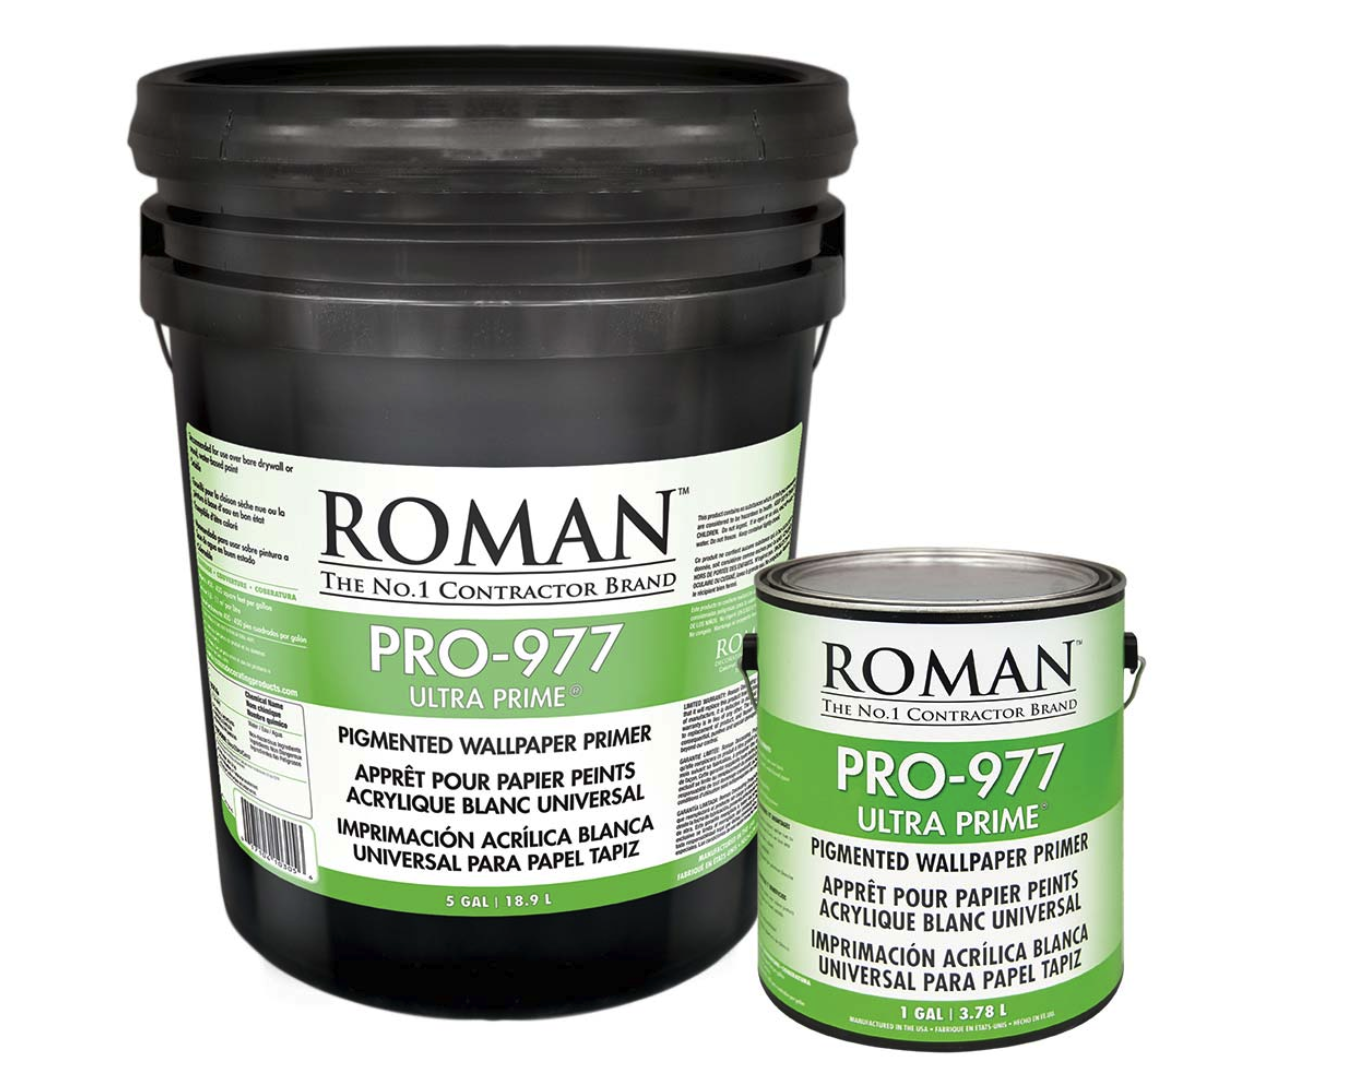 Roman Pro 977 wallpaper prime